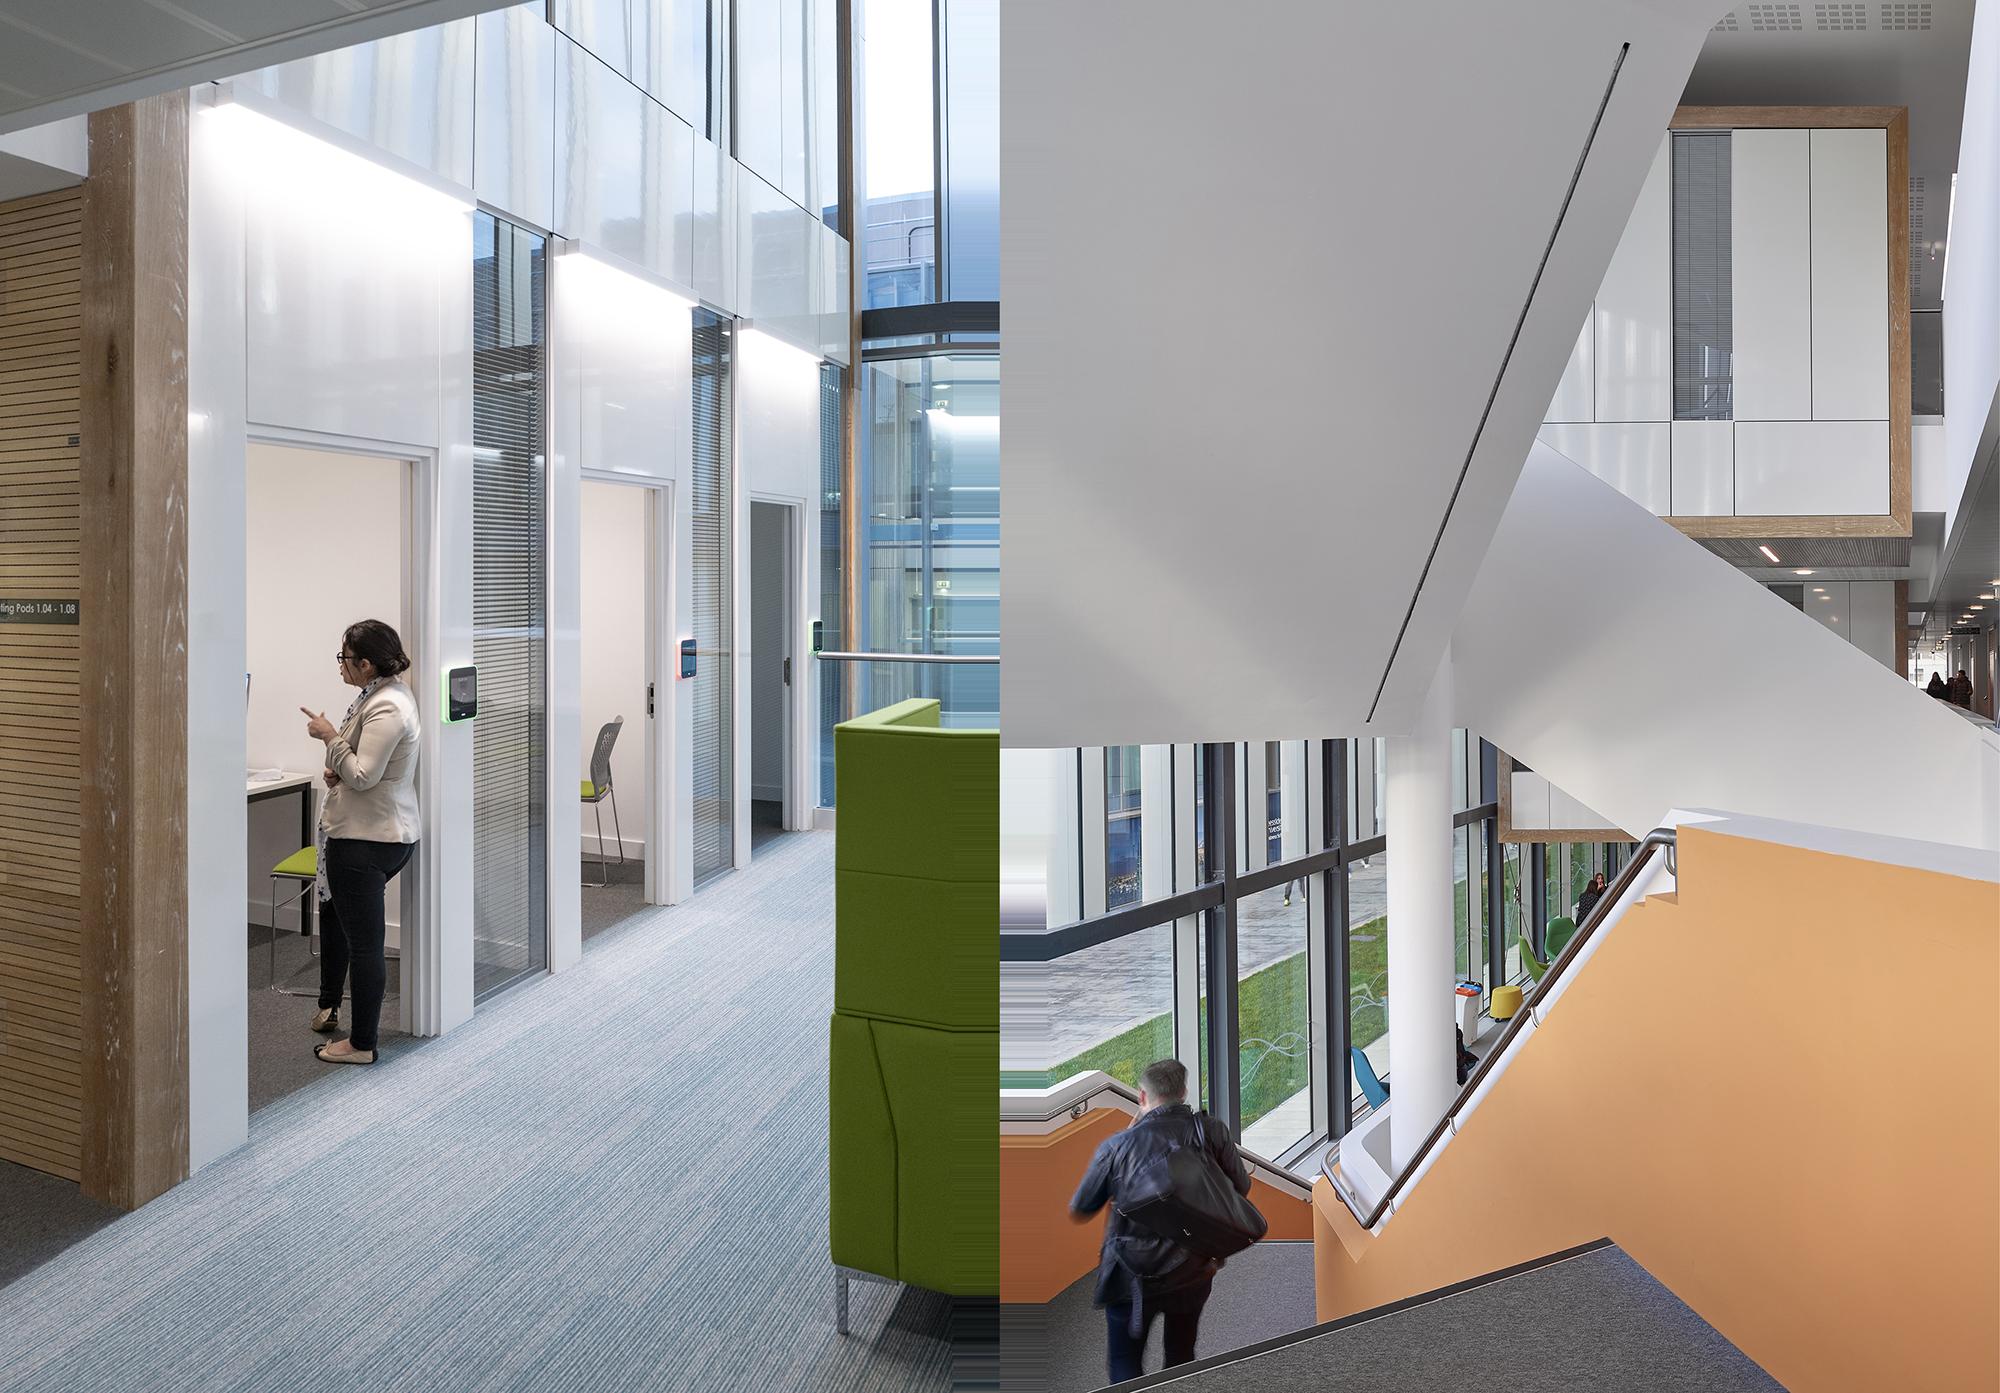 Student Life Building Rics Social Impact Award Faulknerbrowns Architects Education Timber Clad Meeting Pods Dp